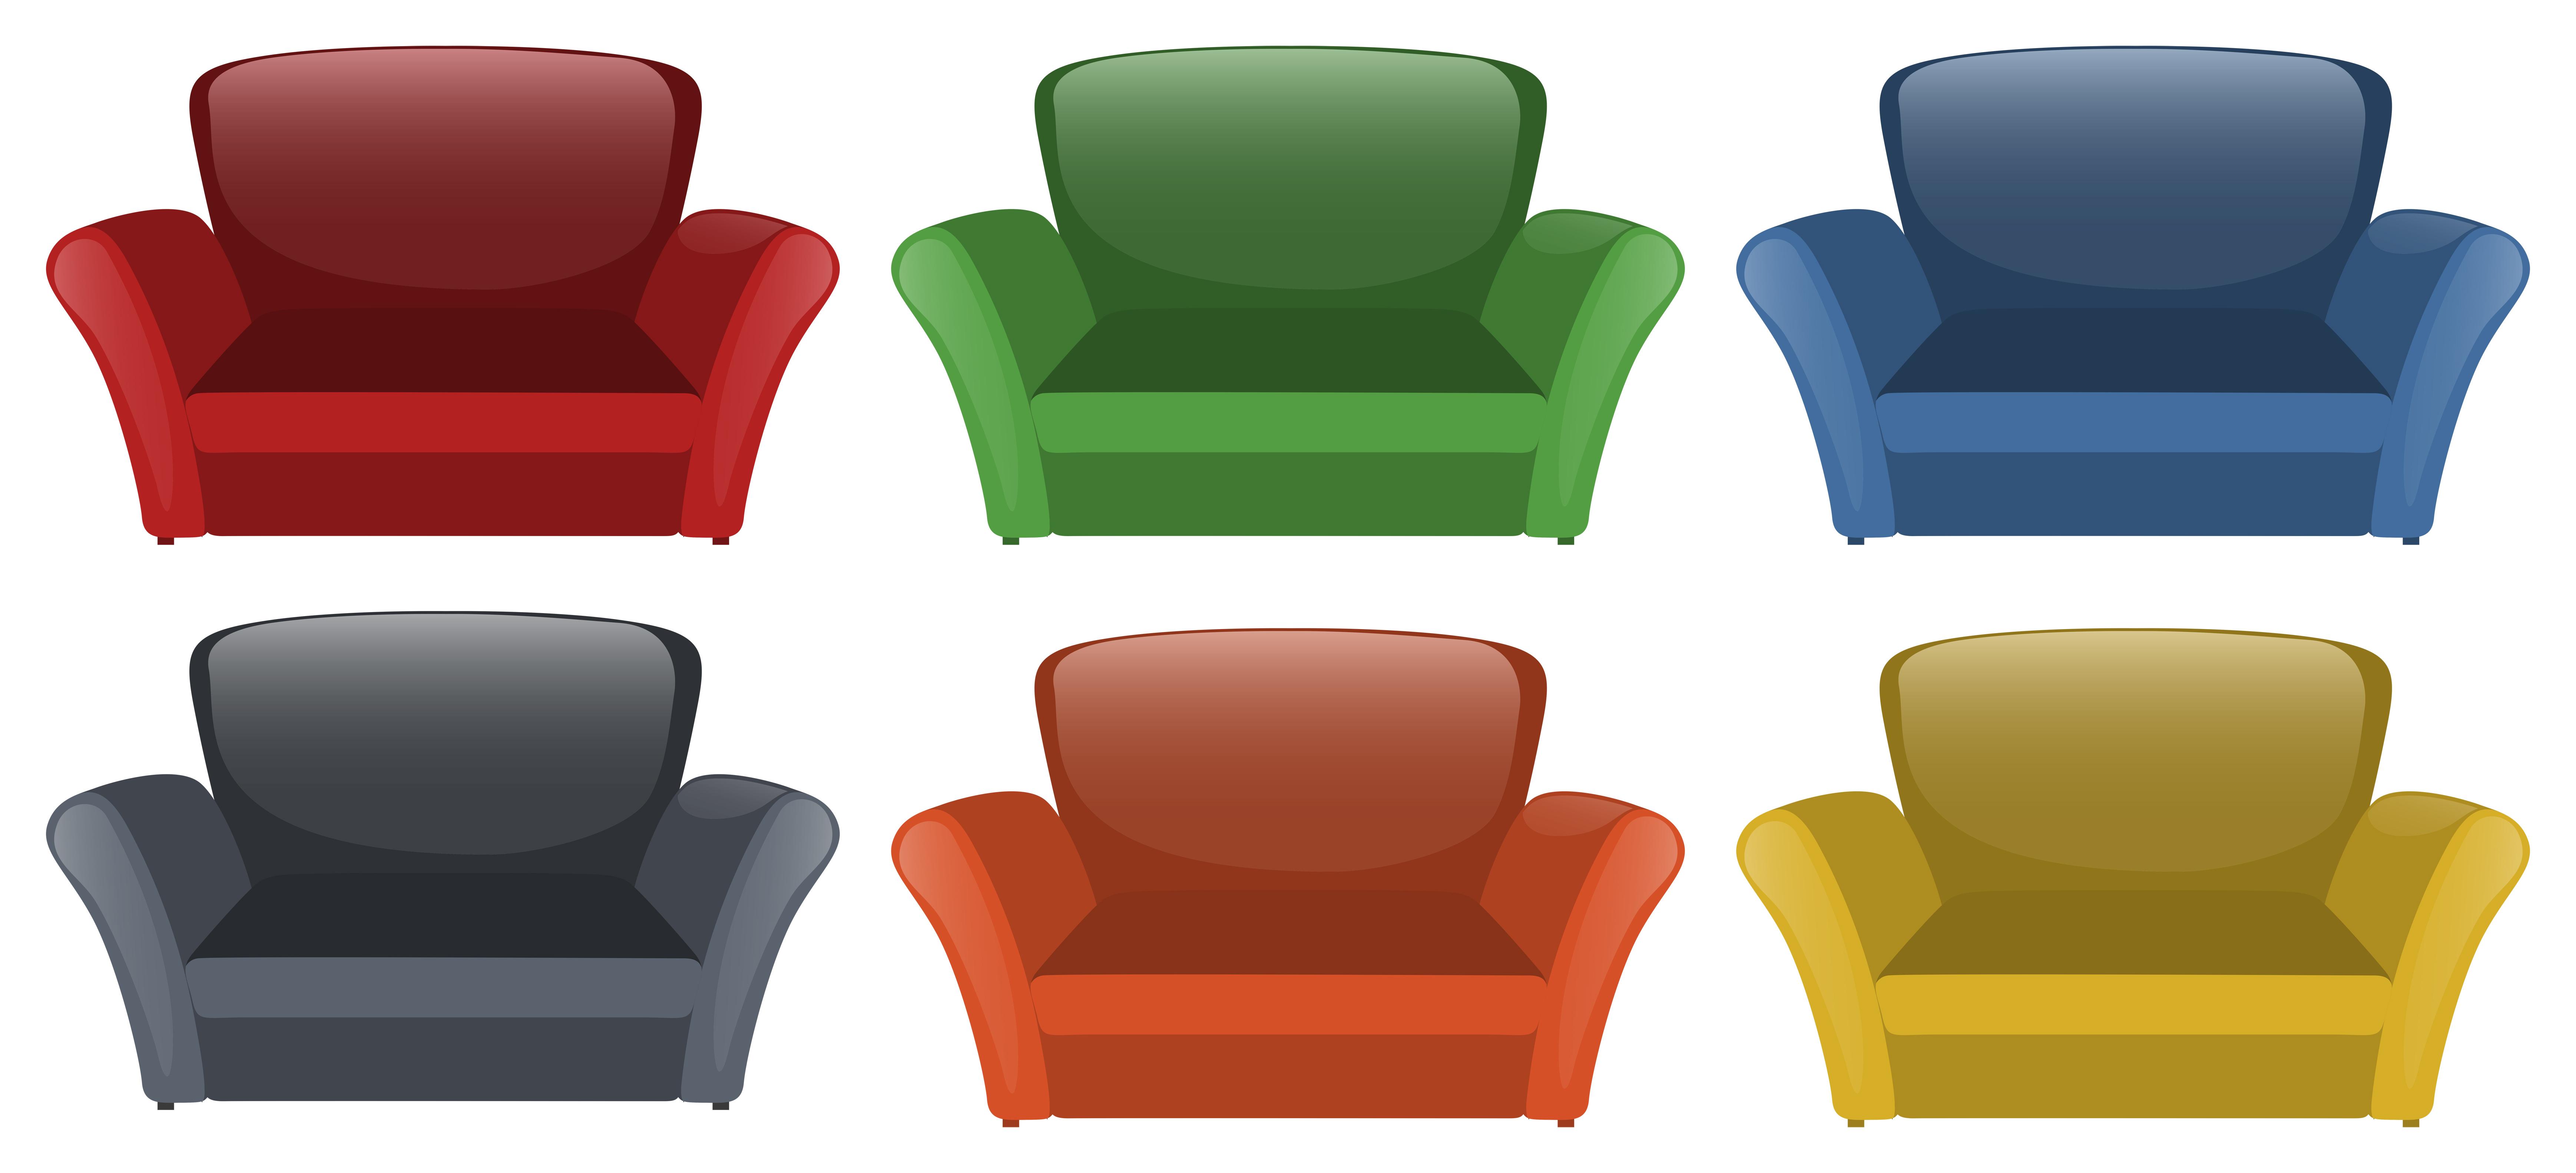 Sofa in six different colors - Download Free Vectors ...